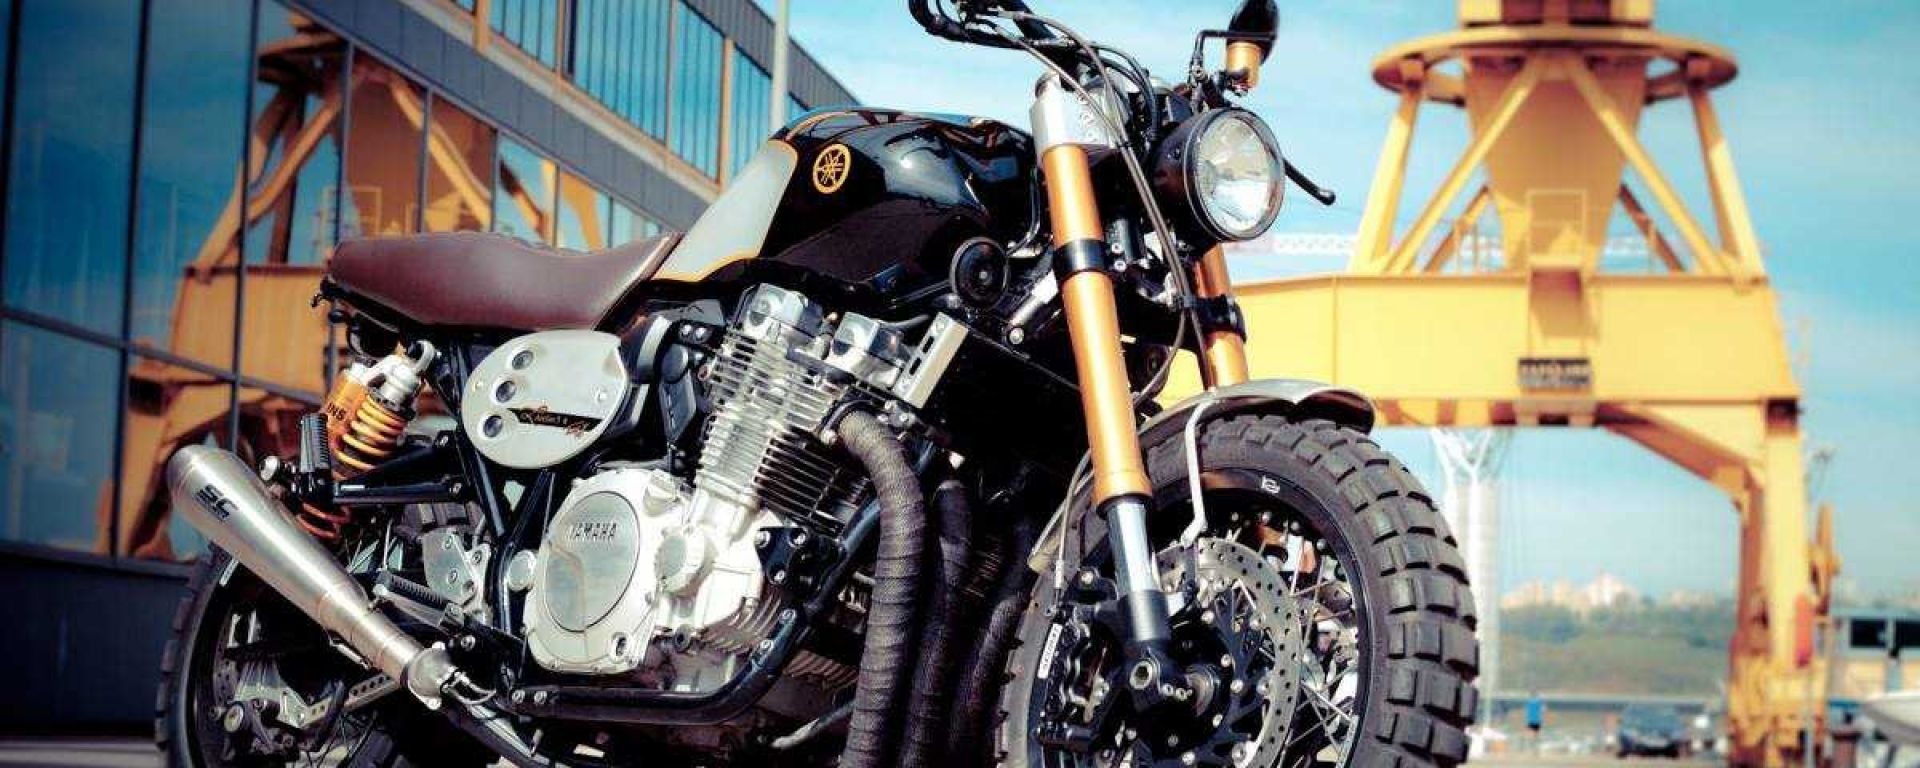 Yamaha XJR1300 by L'Atelier 5